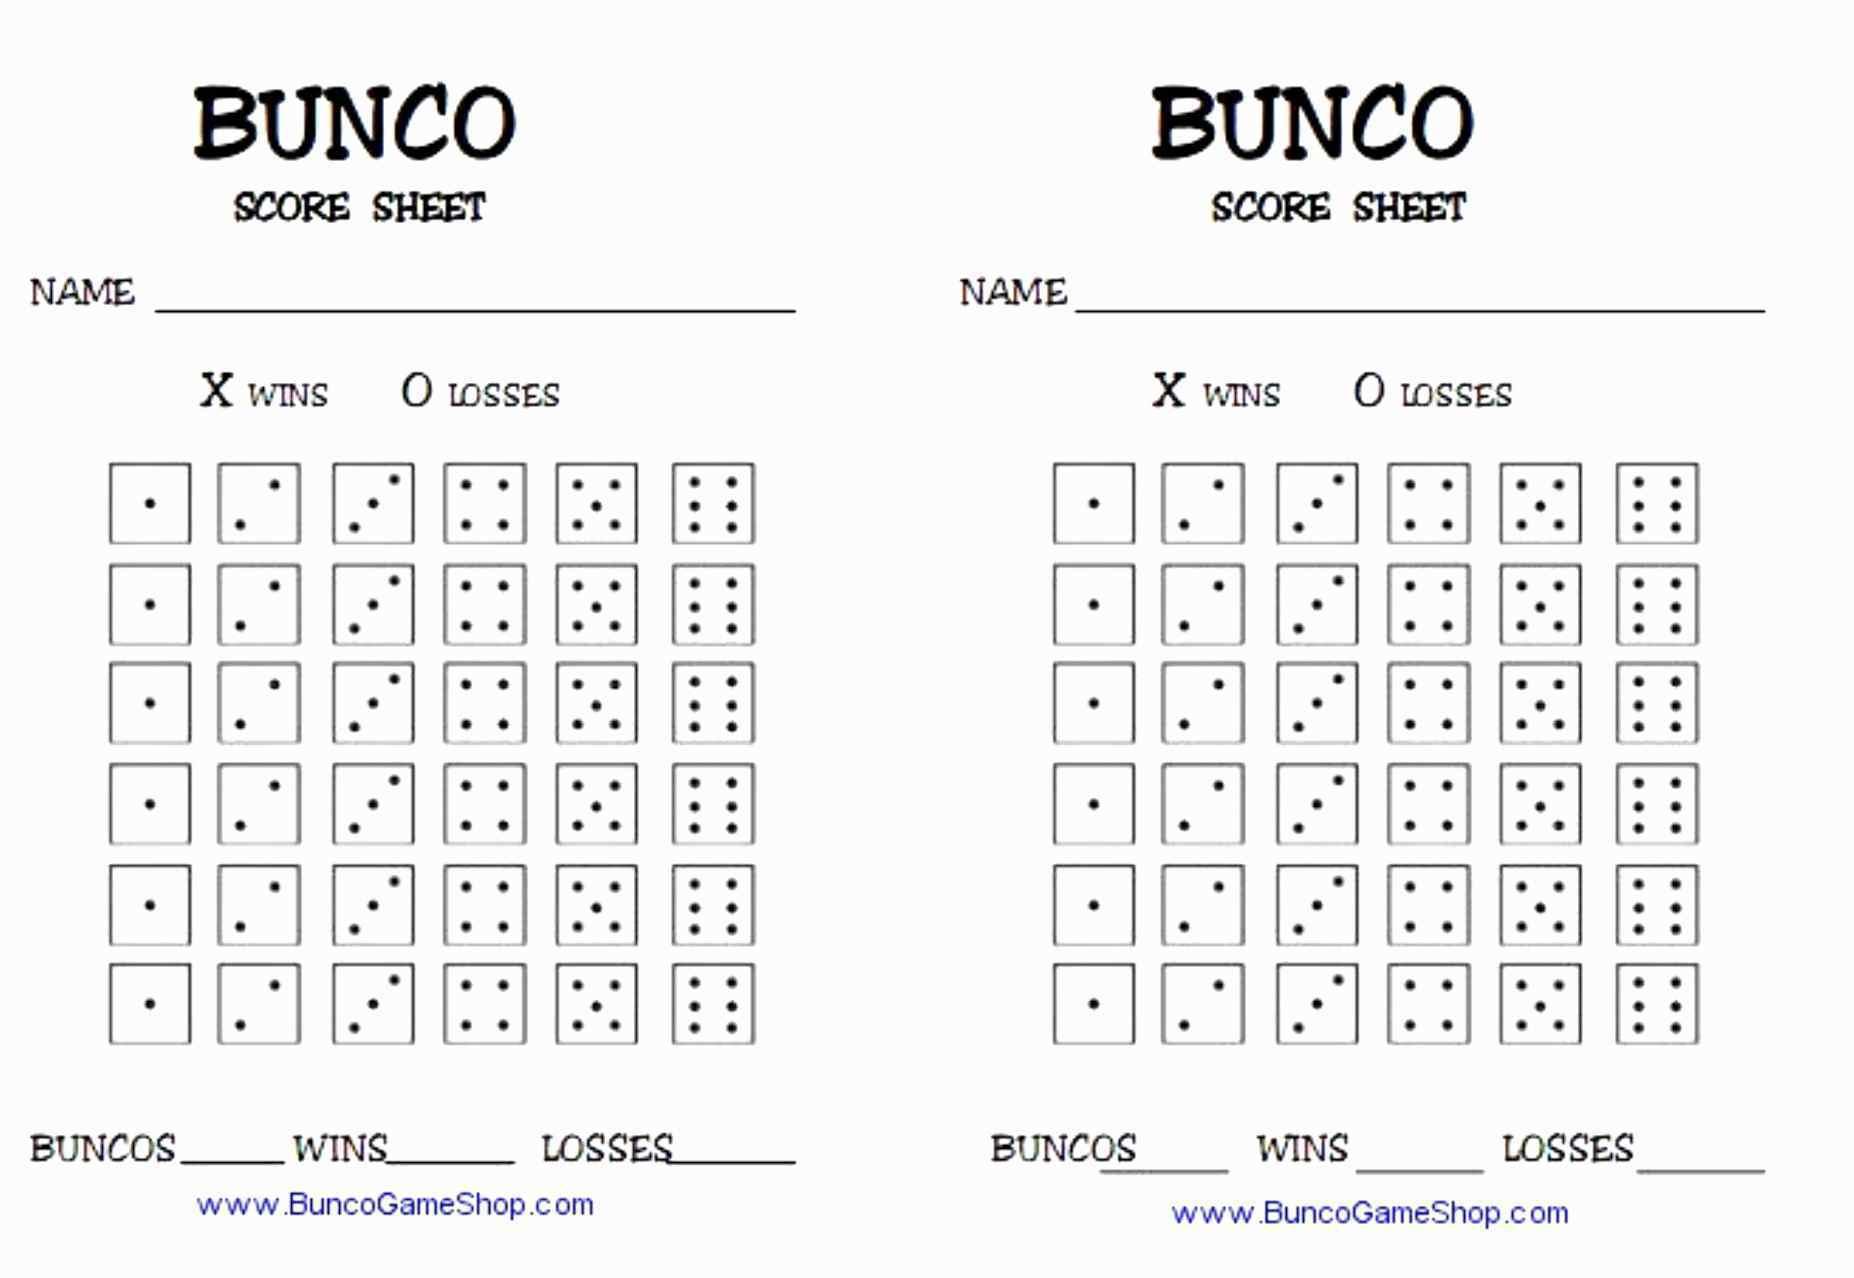 13 Best Of Free Bunco Scorecard Template - Document Template Ideas - Printable Bunco Score Cards Free